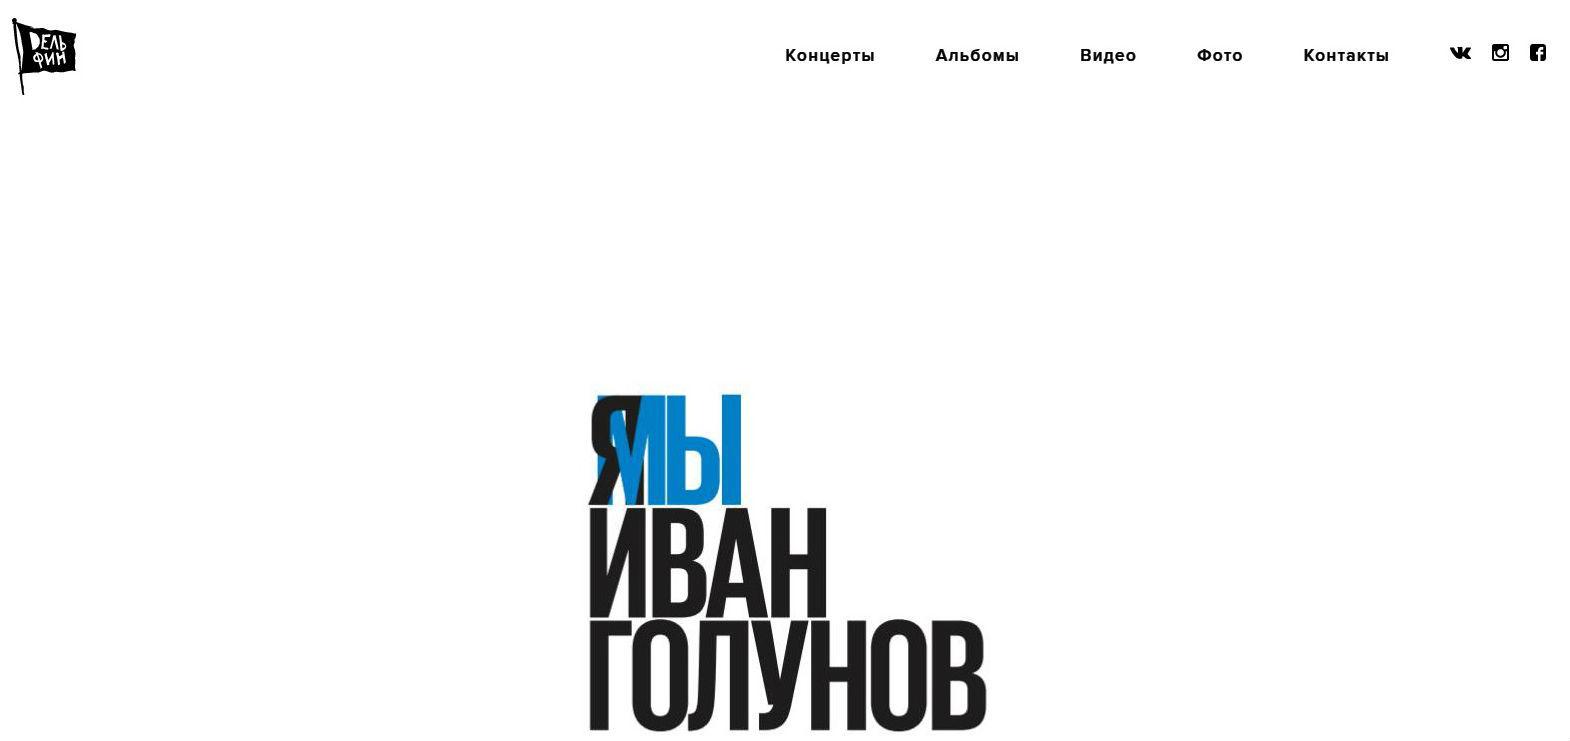 https://cdn.bfm.ru/page/default/2019/06/10/delfin.jpg